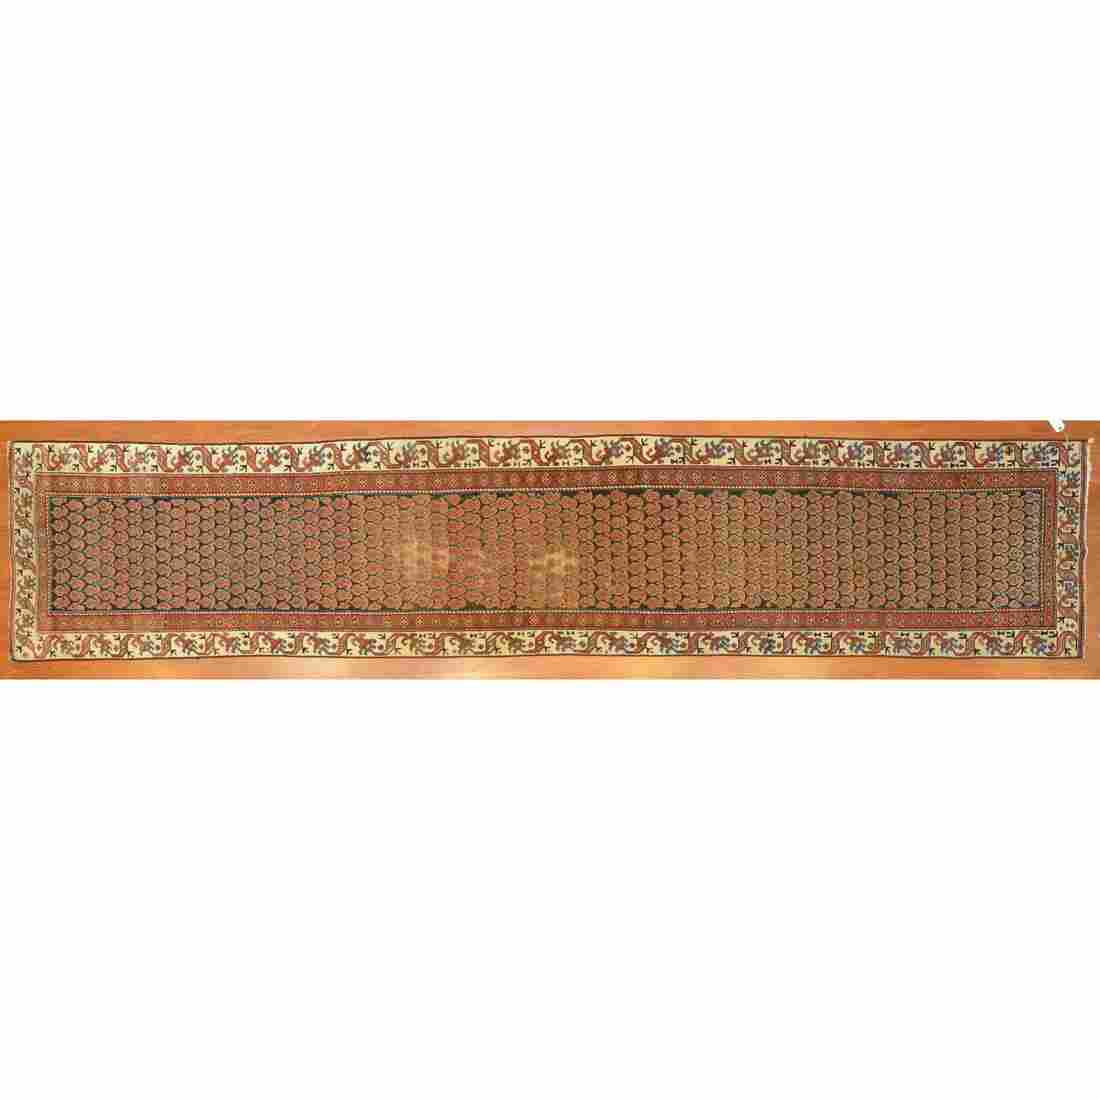 Semi-Antique Malayer Runner, Persia, 2.8 x 13.8